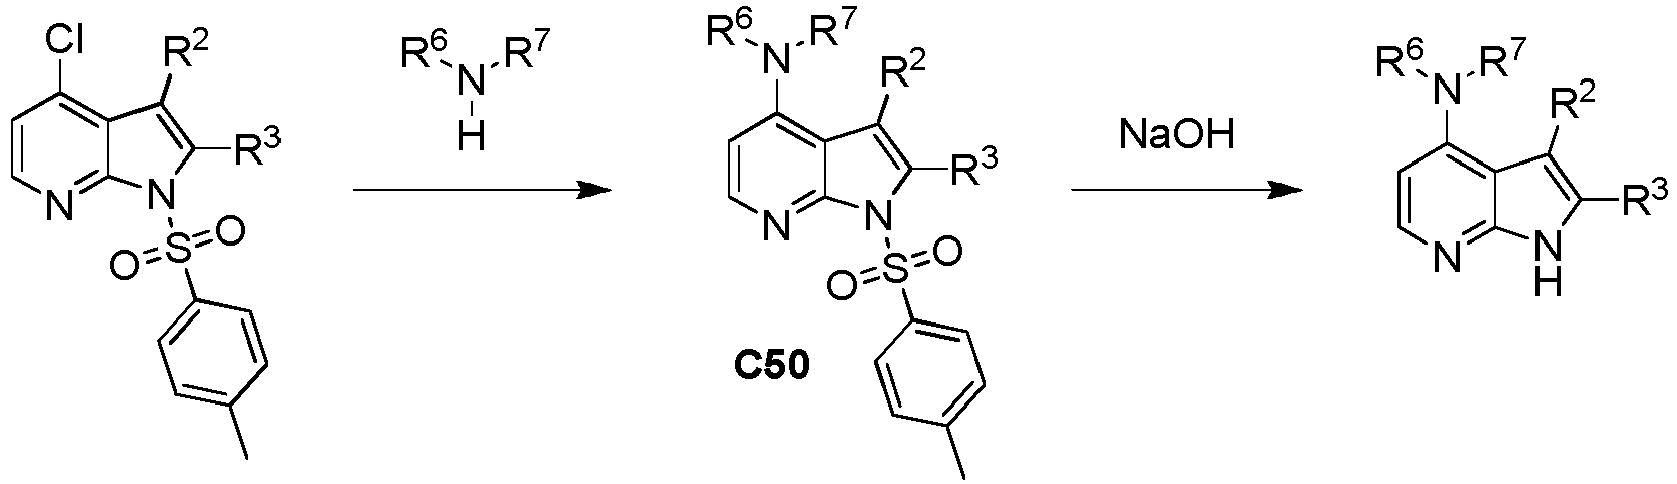 Figure imgb0027